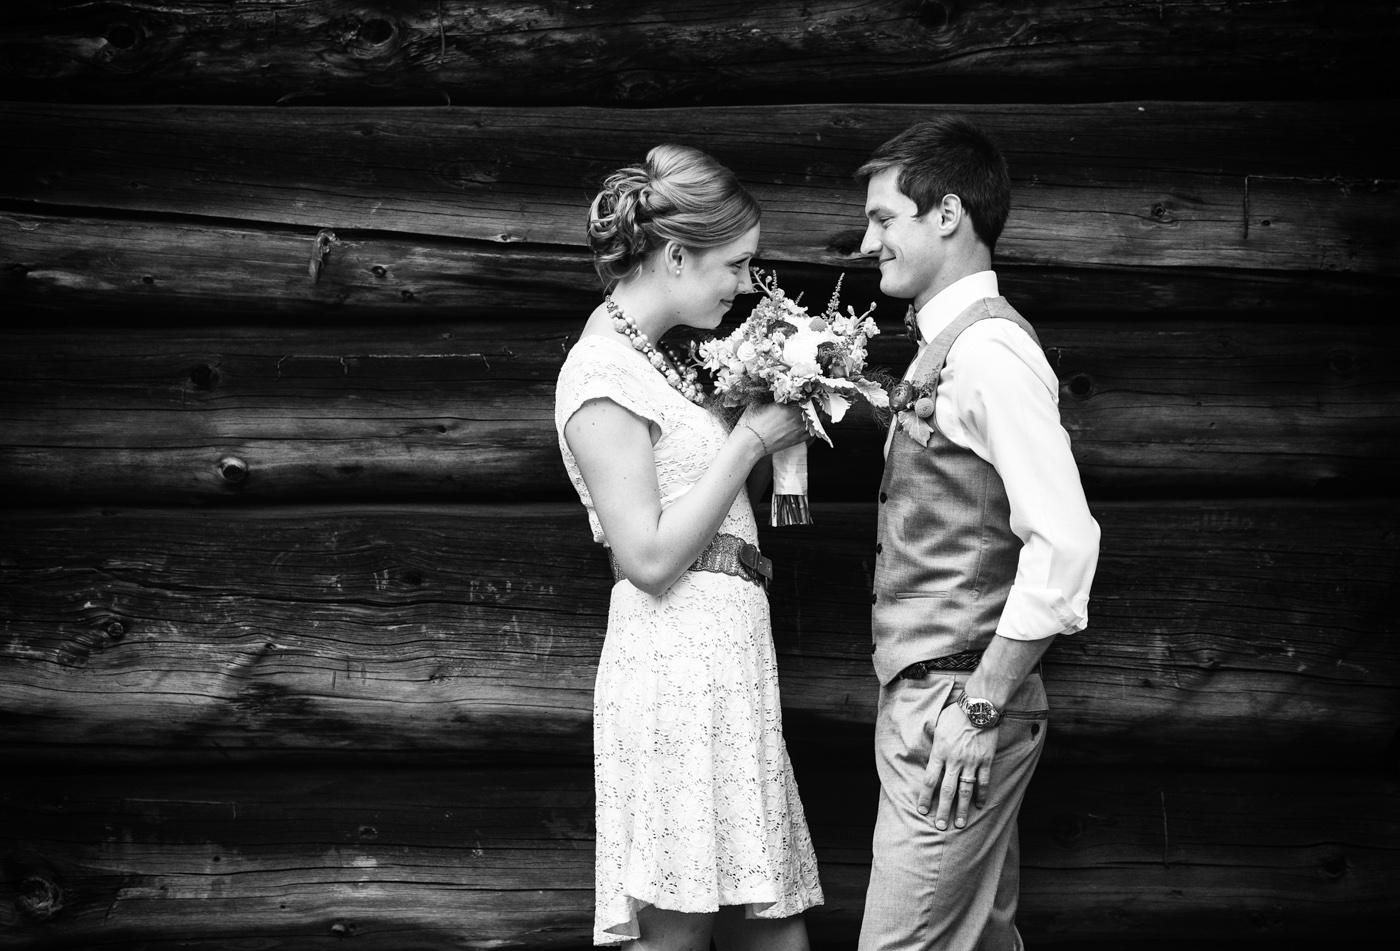 ss_weddingbest-14.jpg